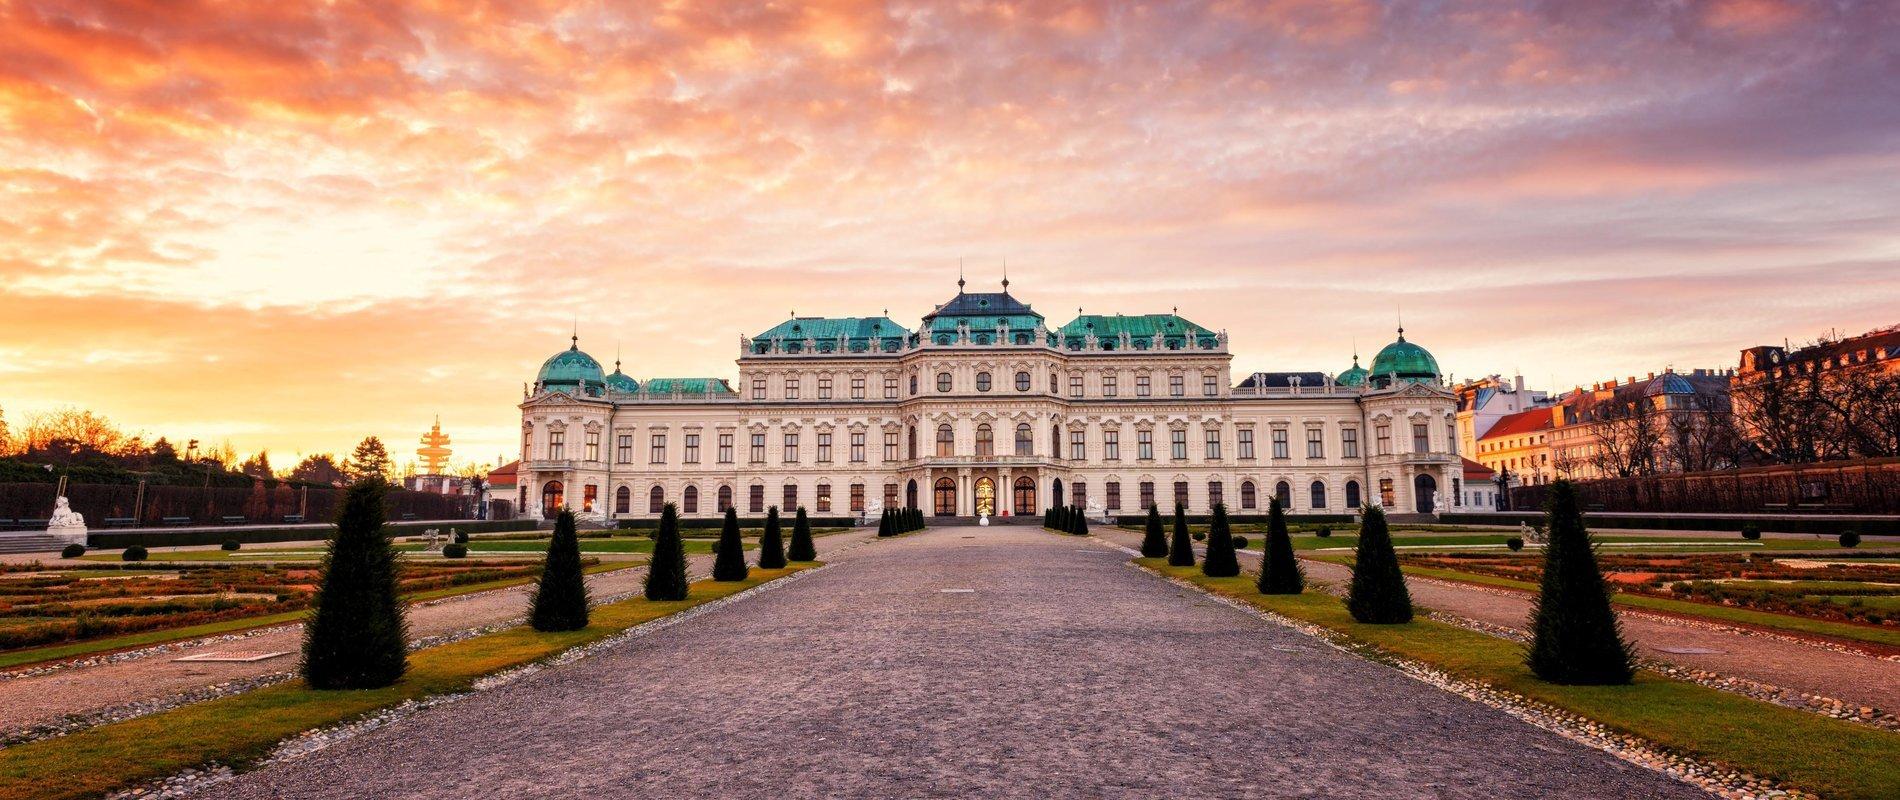 Vienna Sightseeing - Collection